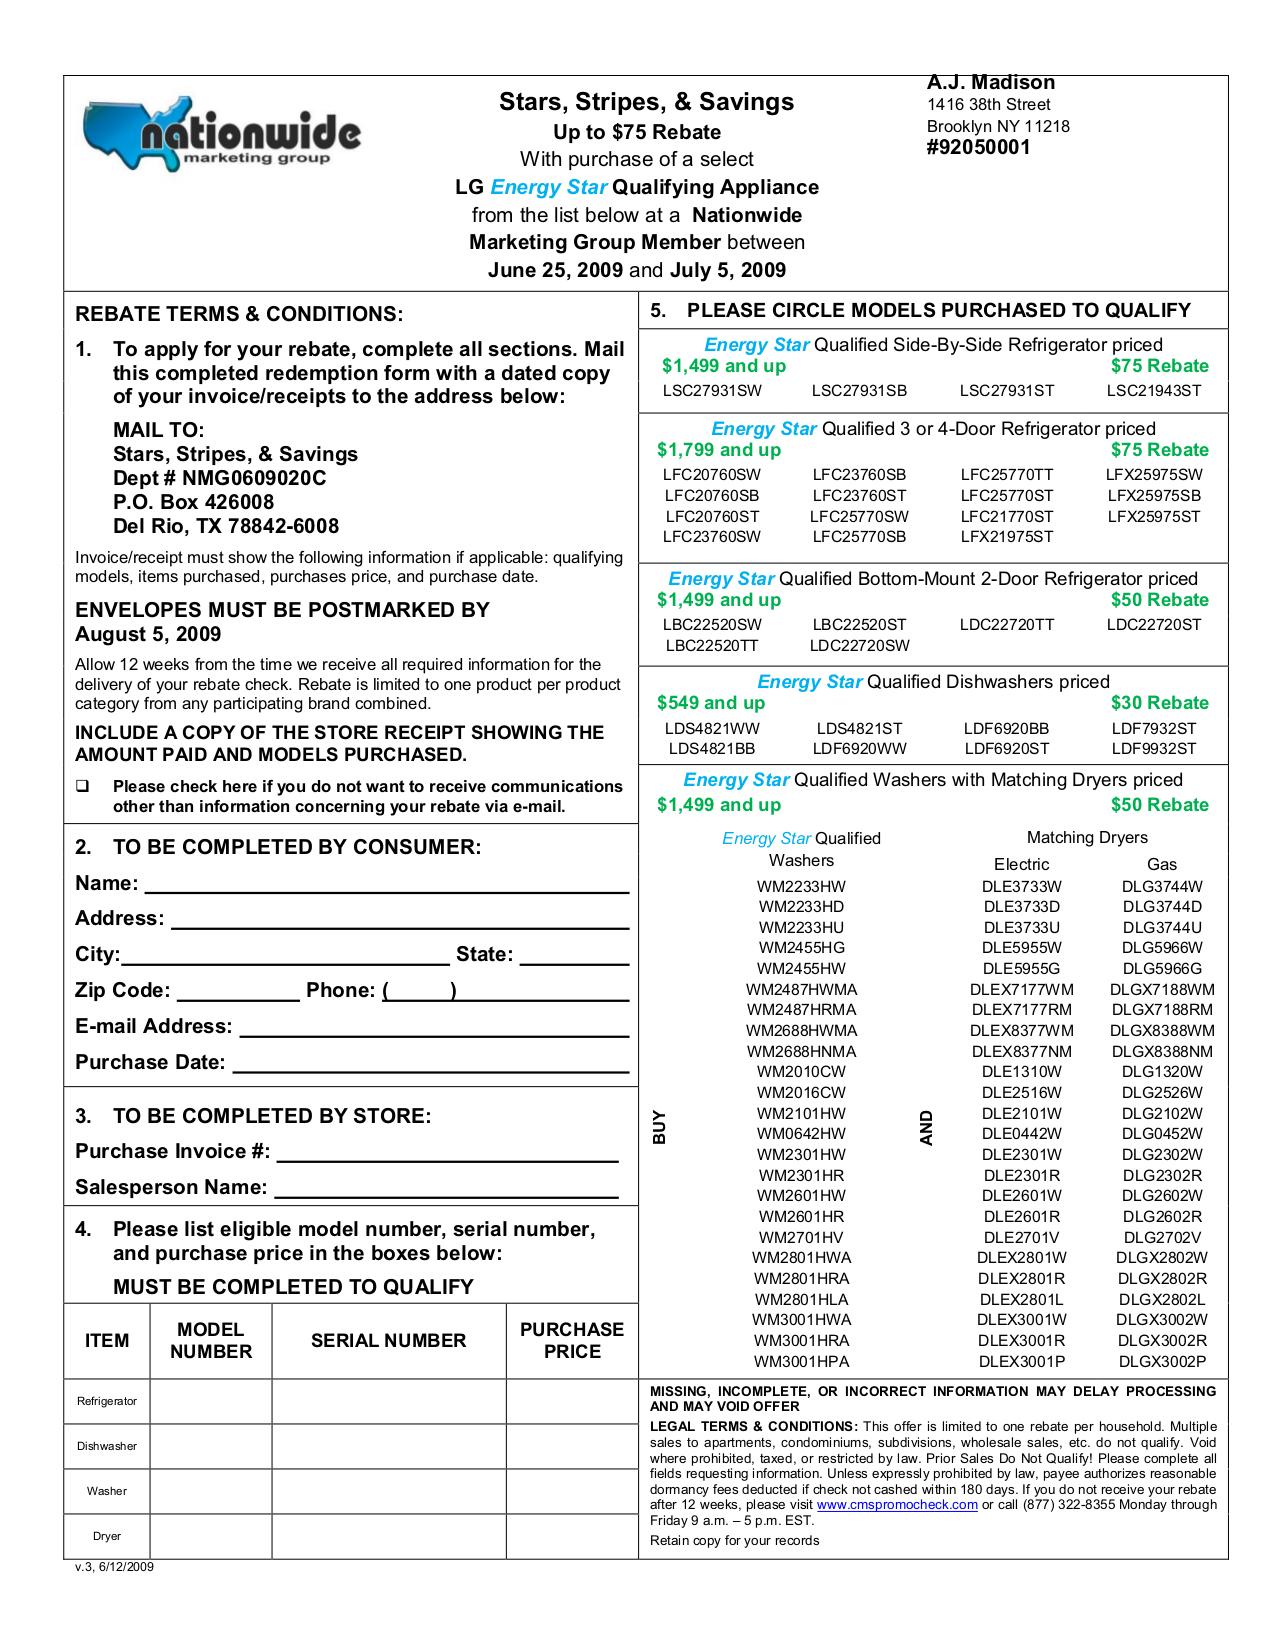 pdf for LG Refrigerator LBC22520TT manual